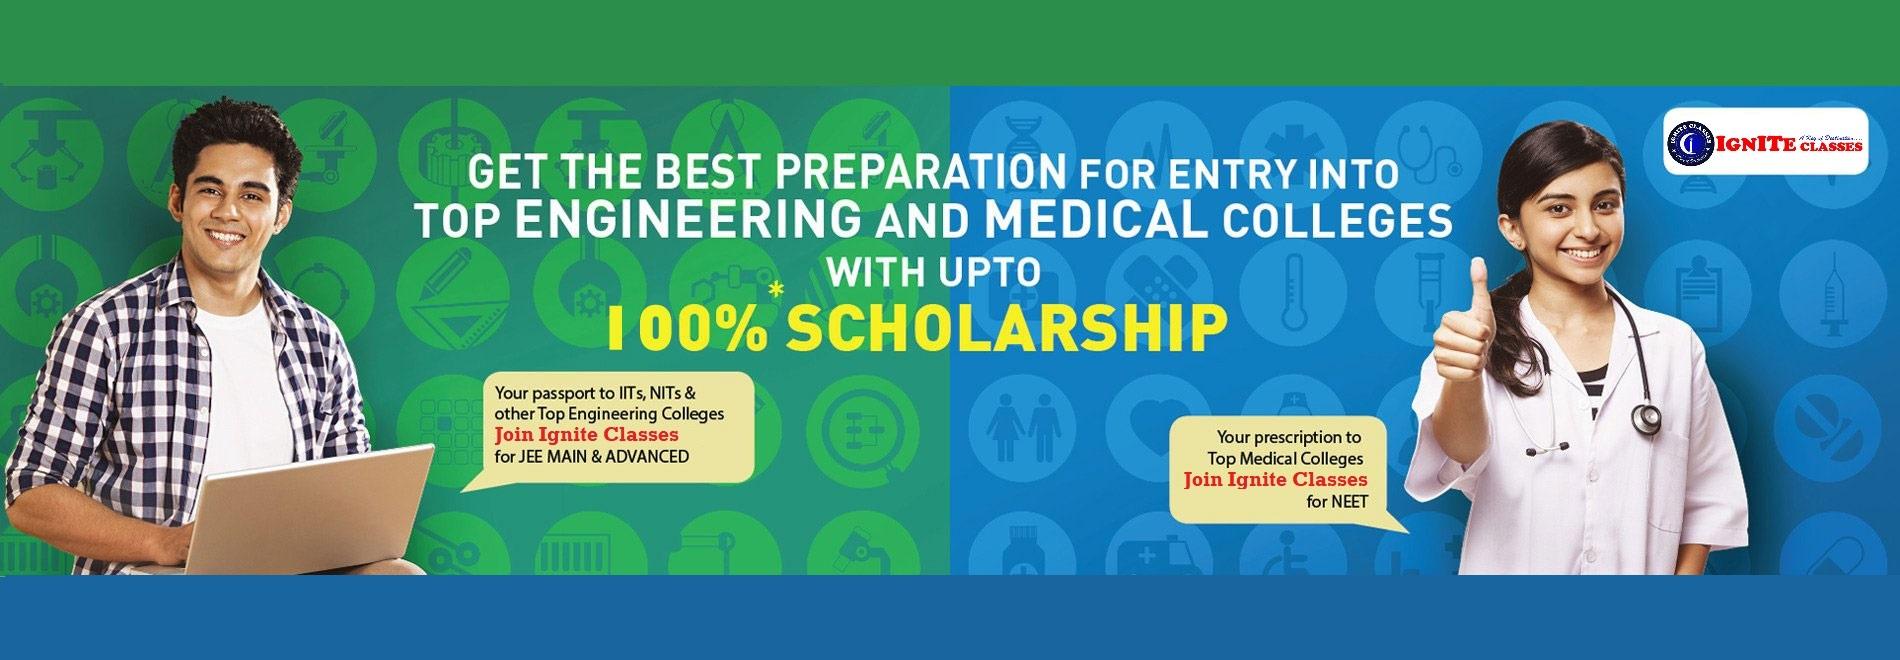 vmc-admission-banner